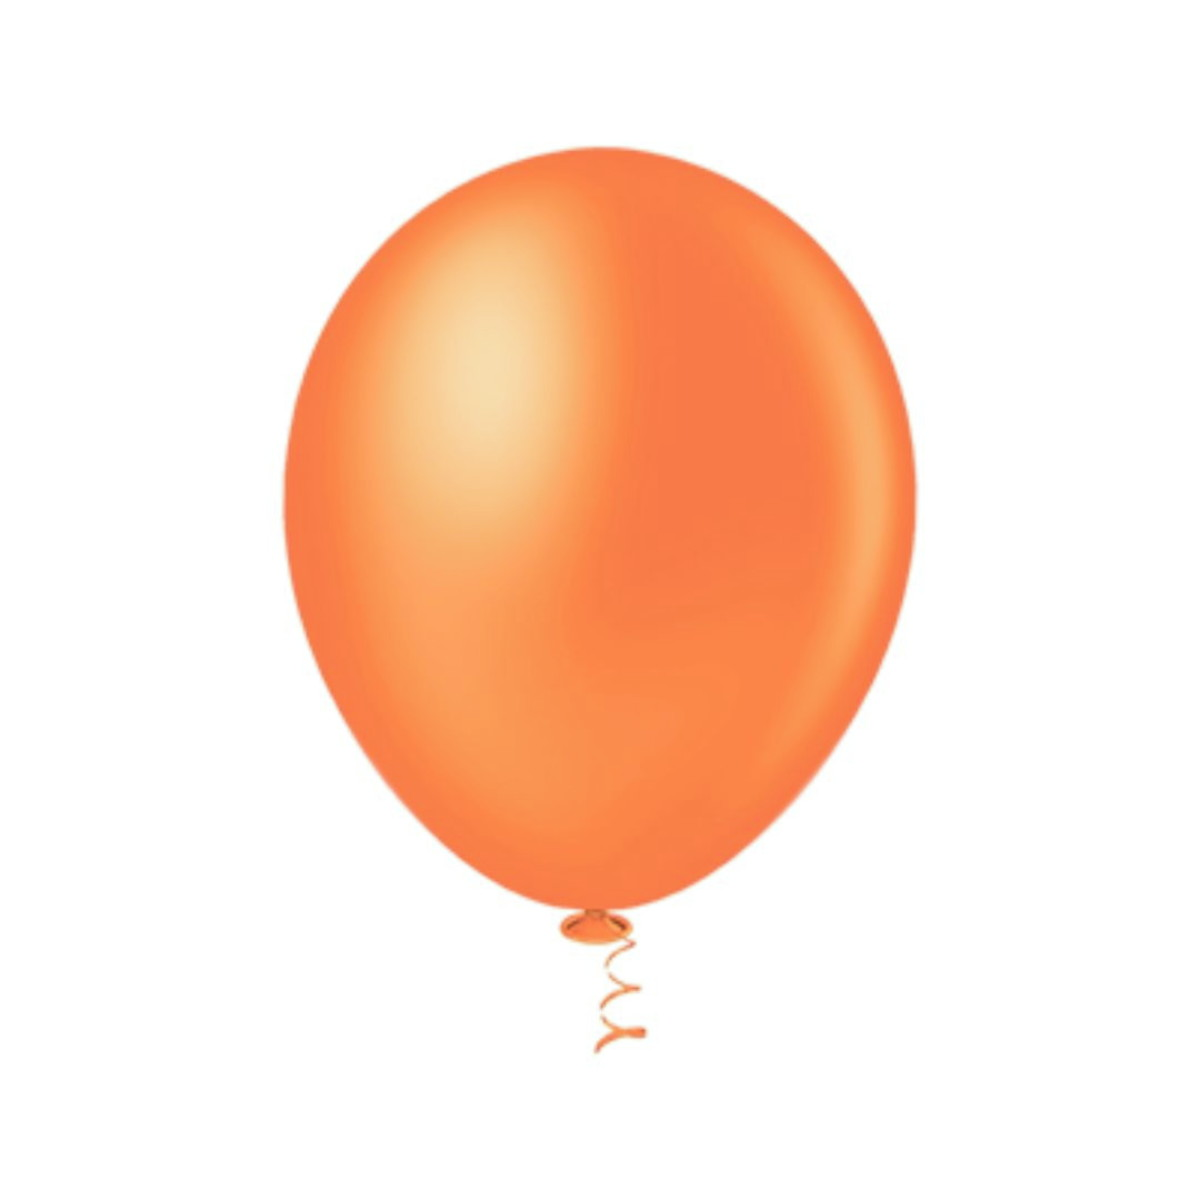 50 Unid Balão Bexiga Látex Laranja Tamanho 9